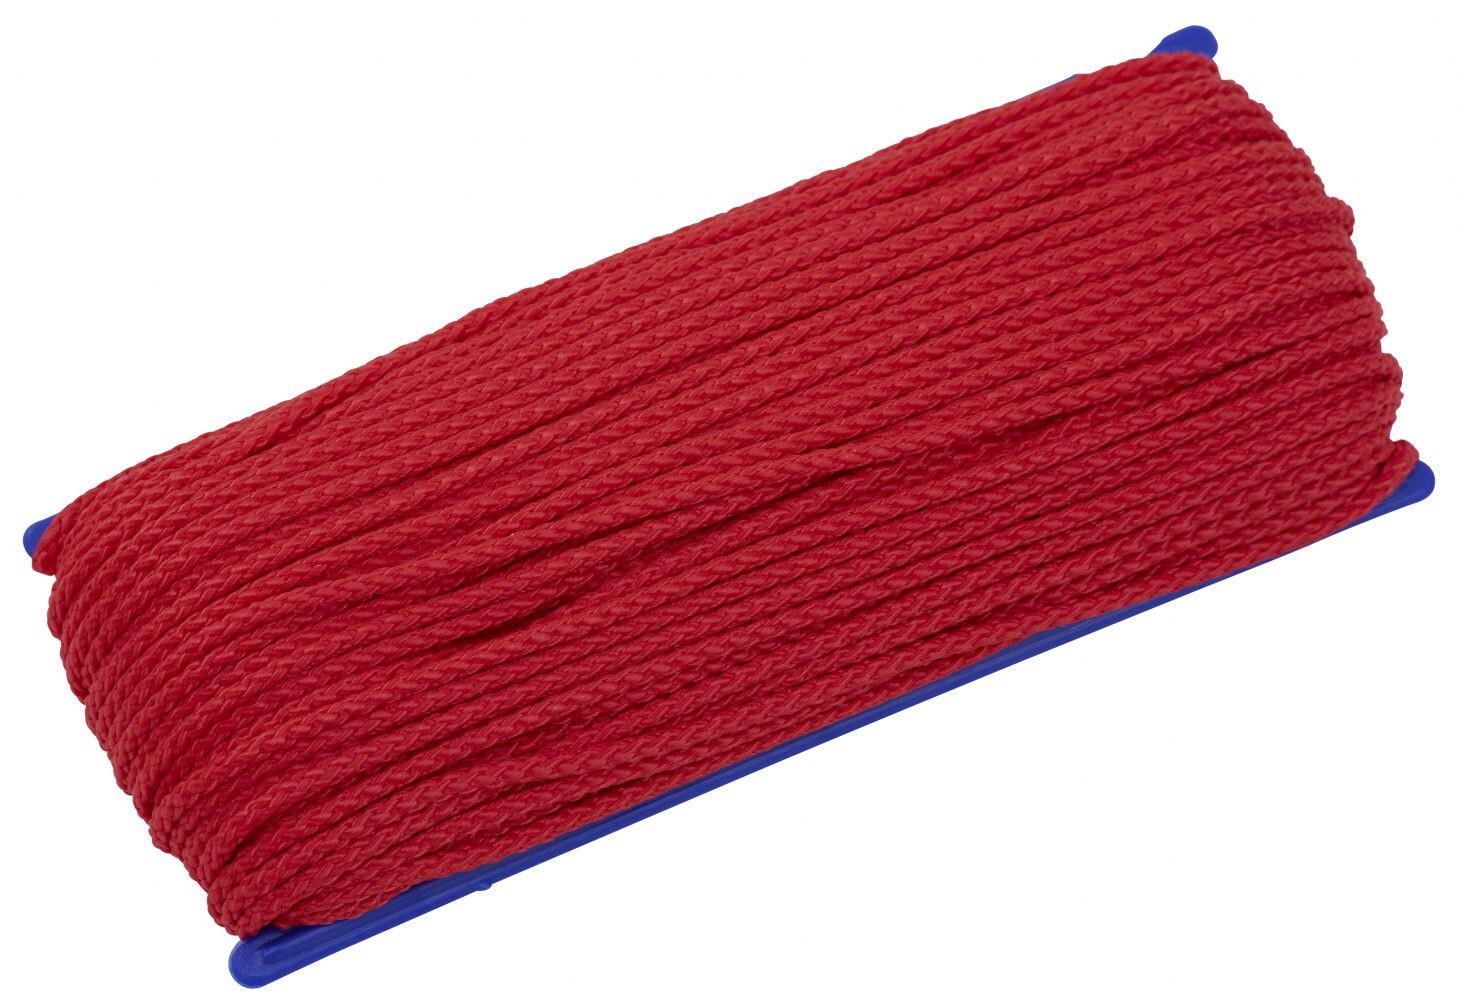 Cordage 6464330 serrage corde zeltleine 20m 3mm de camping star 1m = 0,35 €